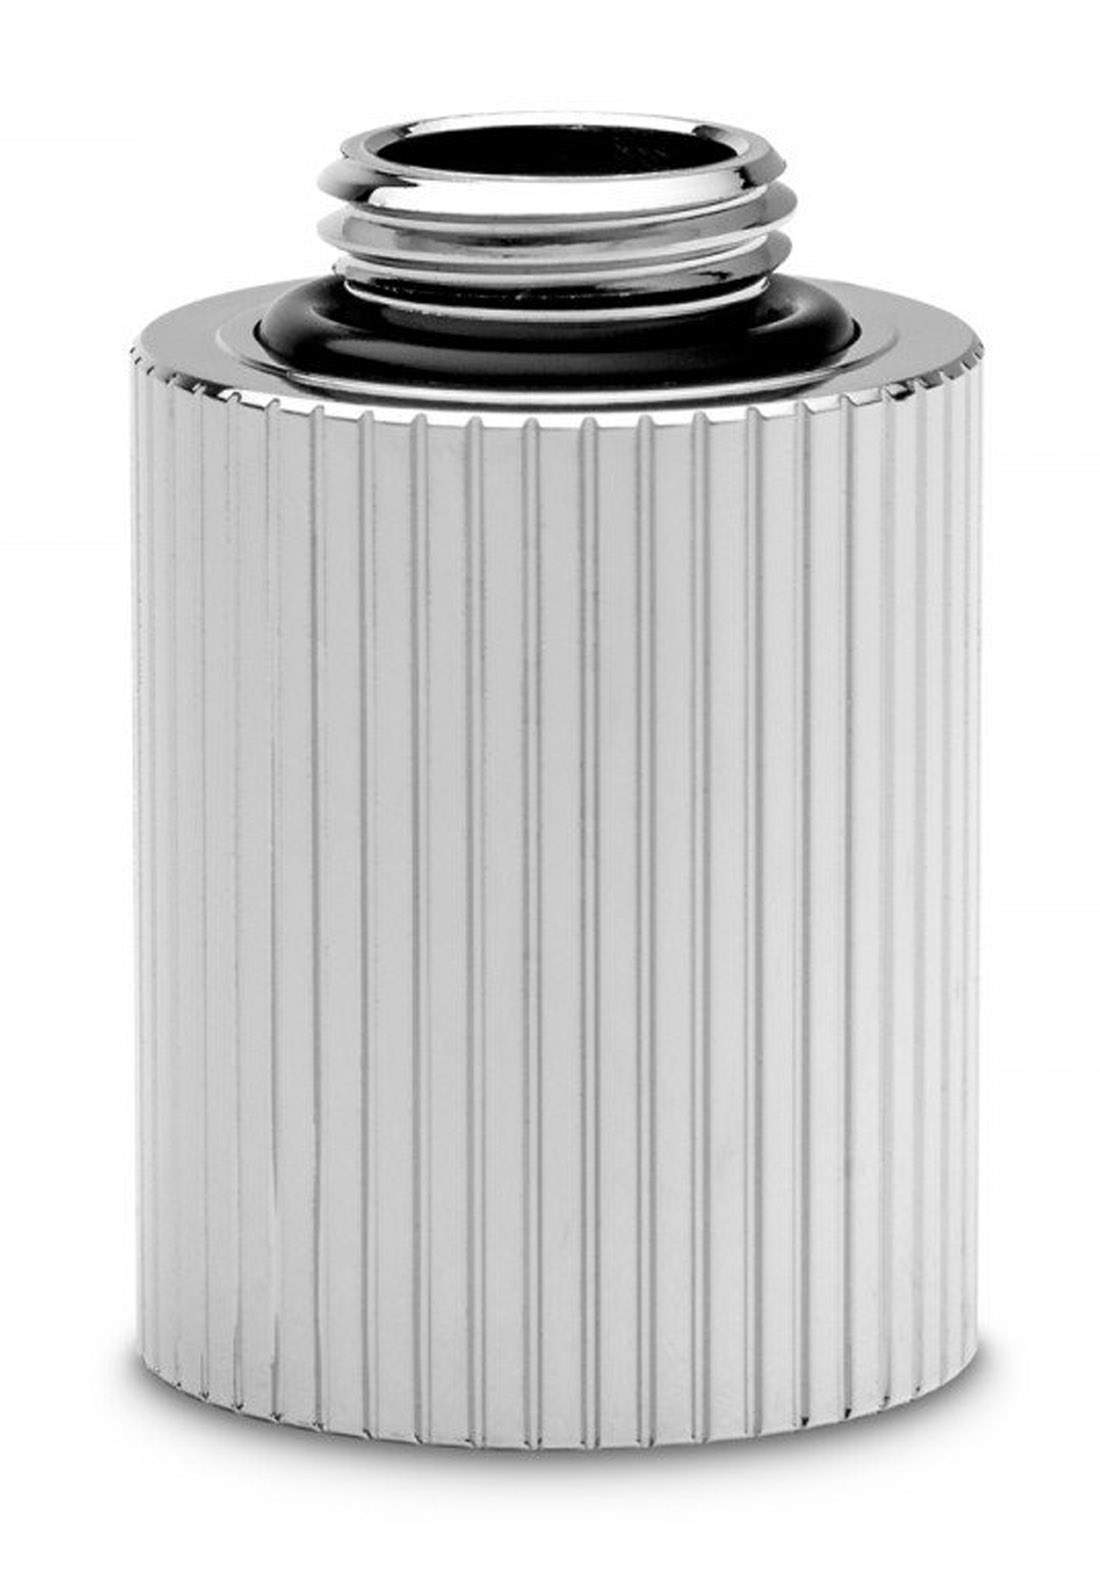 EK-Quantum Torque Extender Static MF 28 - Nickel